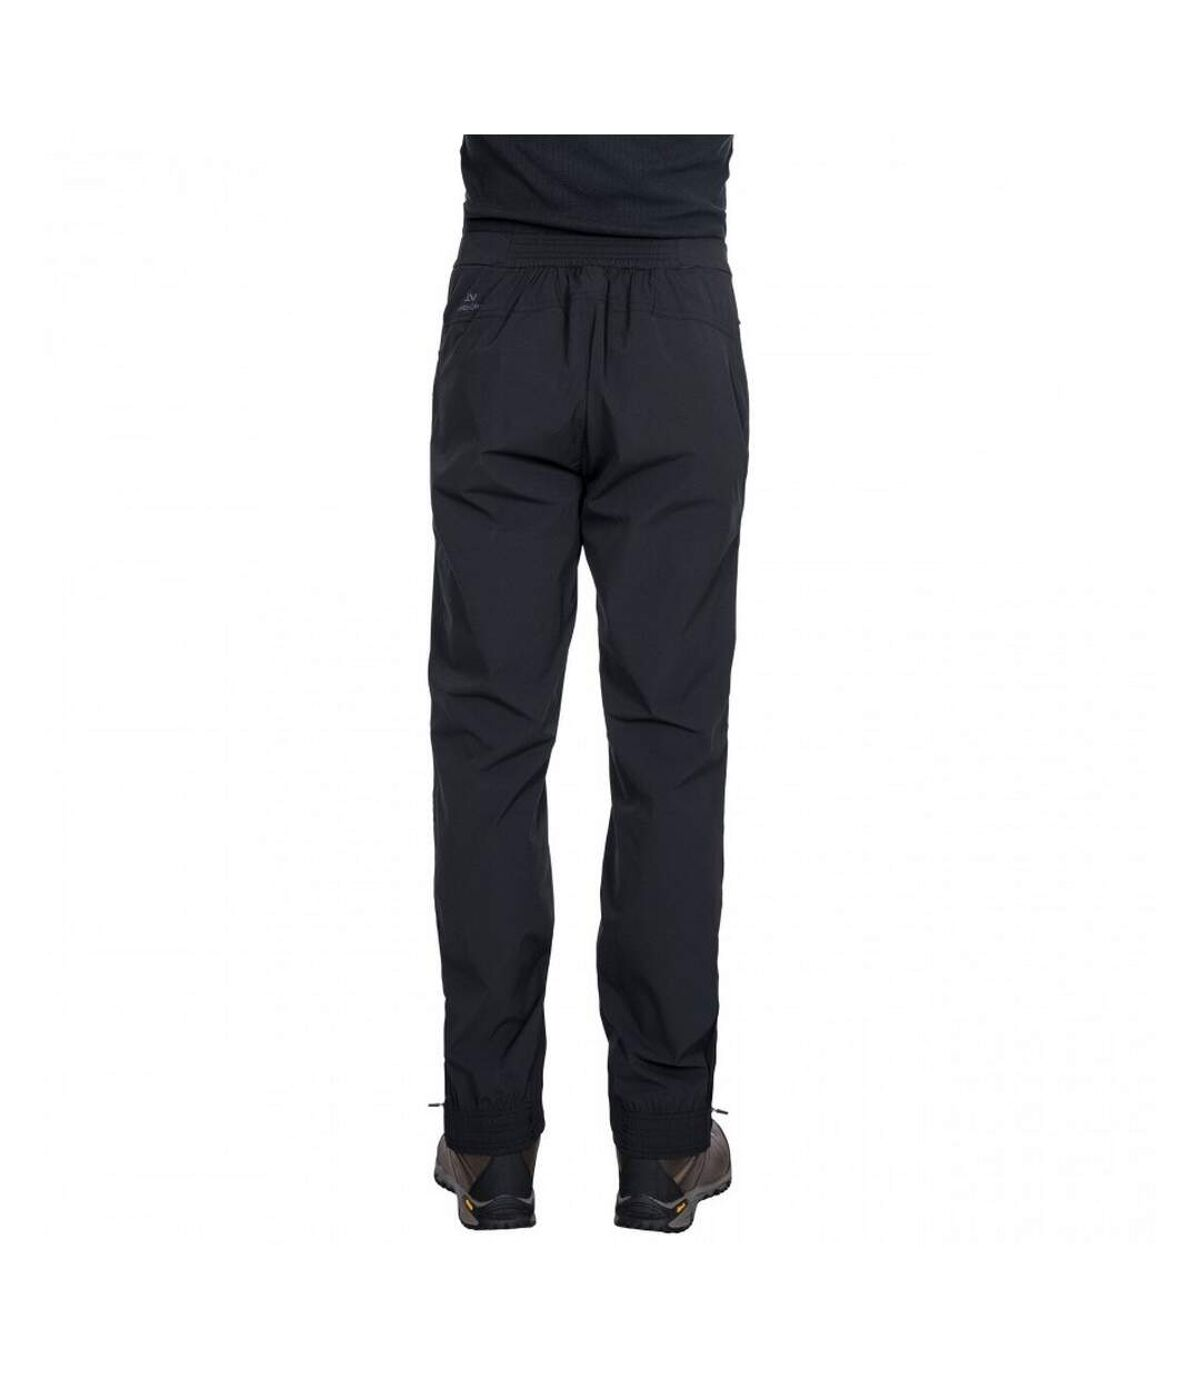 Trespass Mens Stormed Adventure Trousers (Black) - UTTP4113